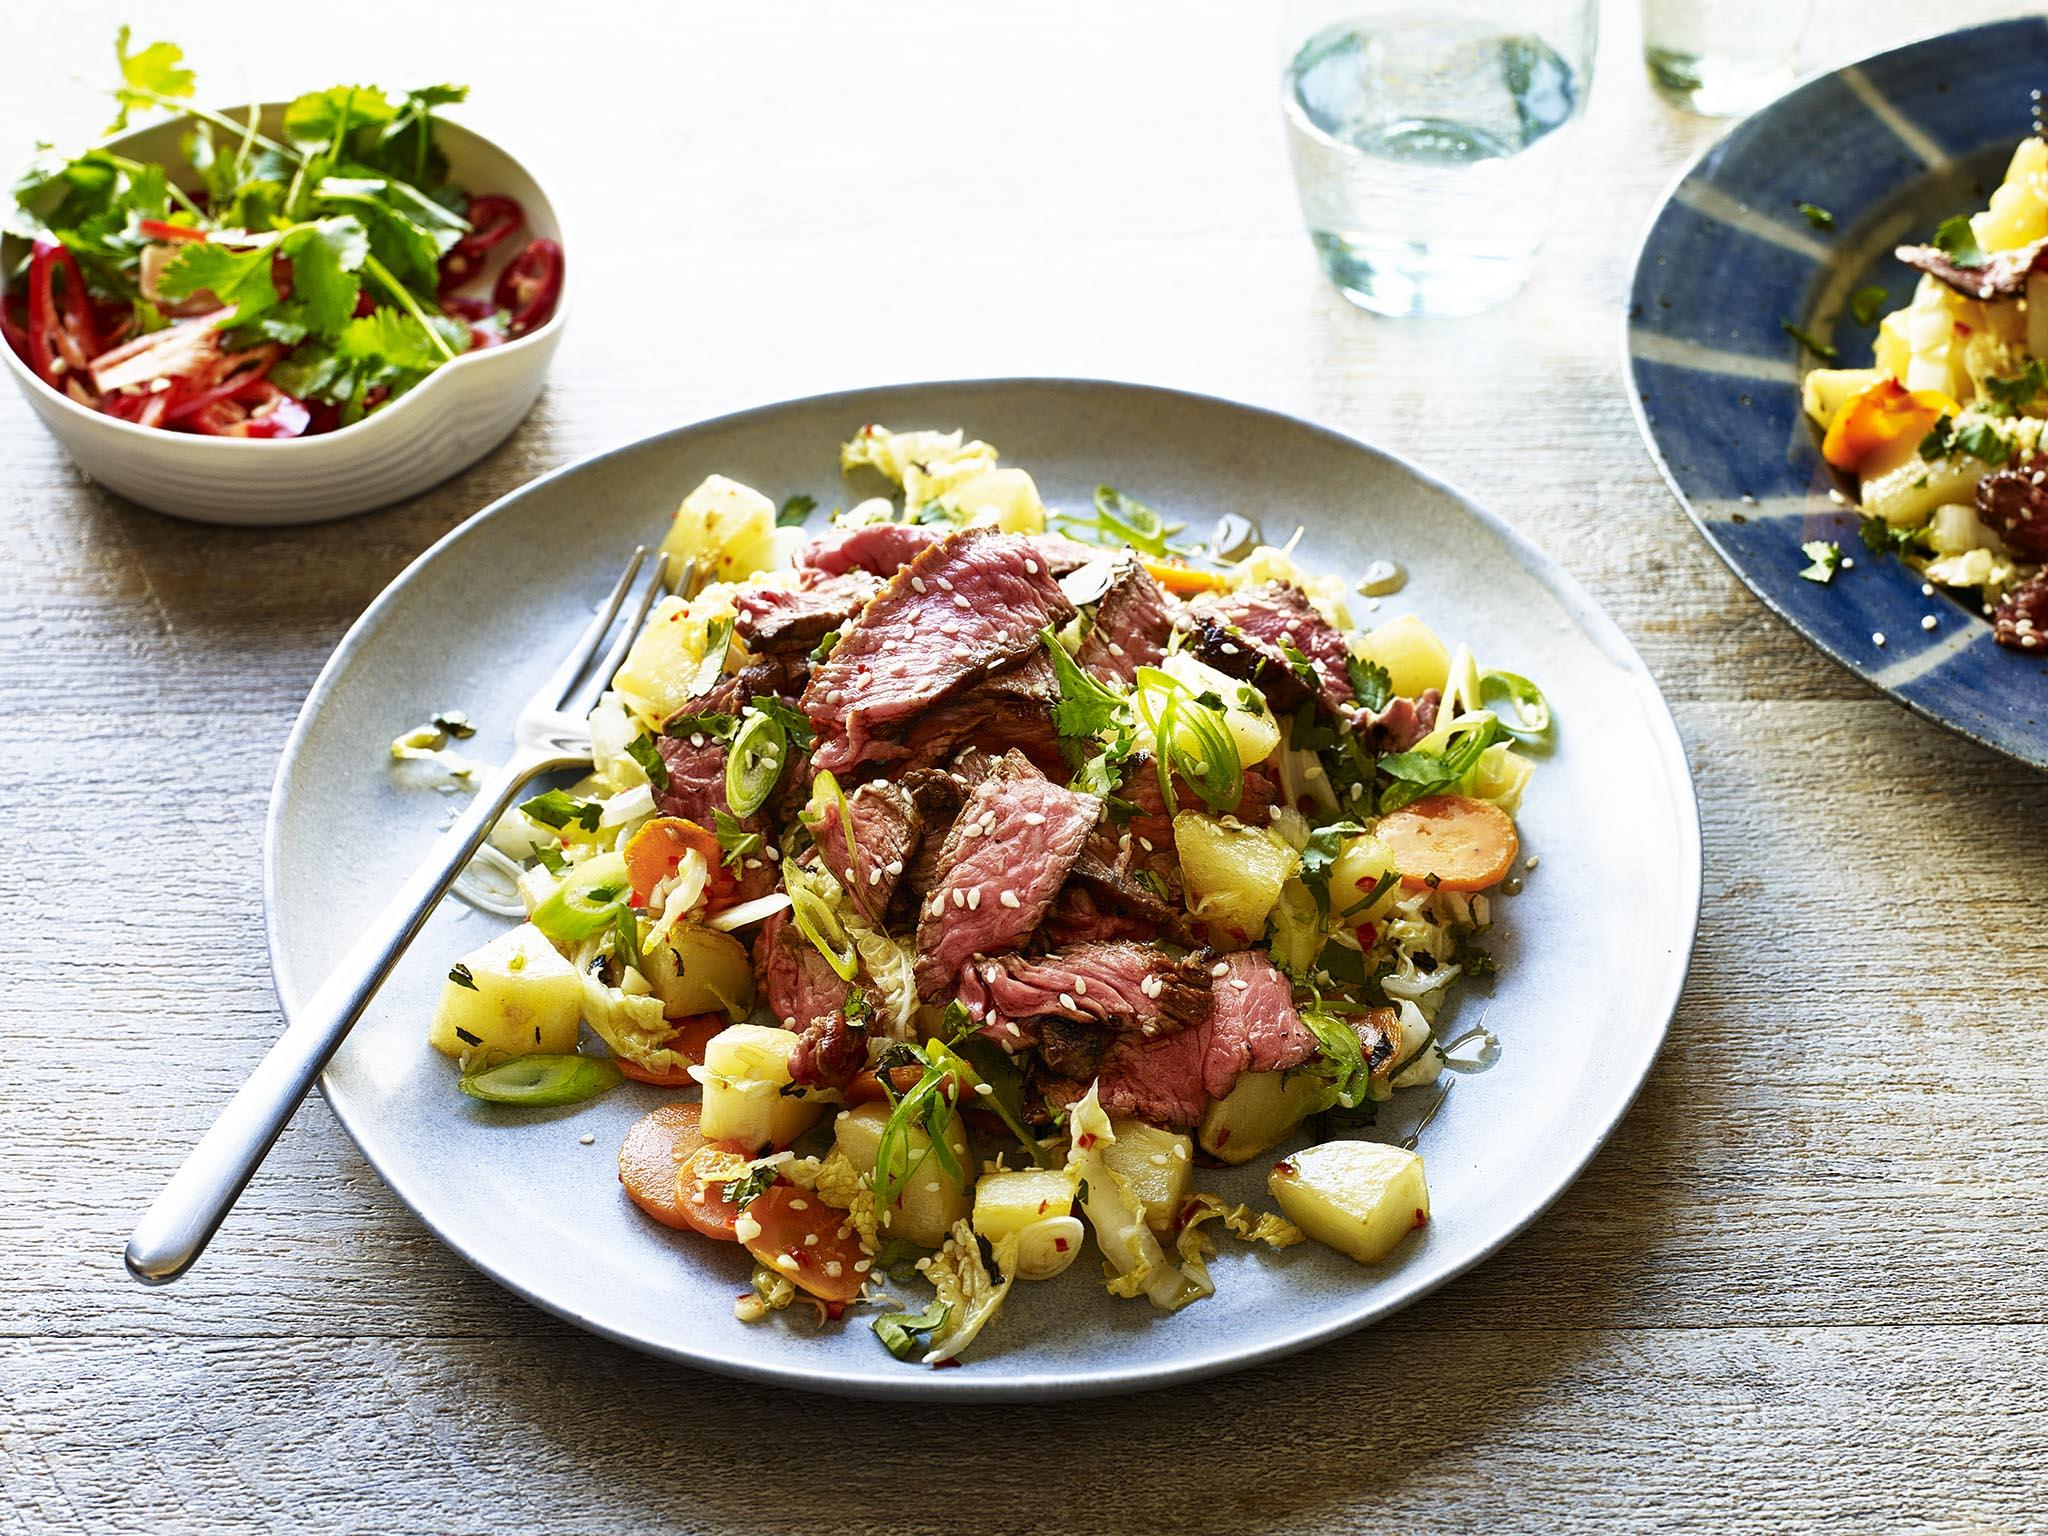 How to make a Thai beef and potato salad 1